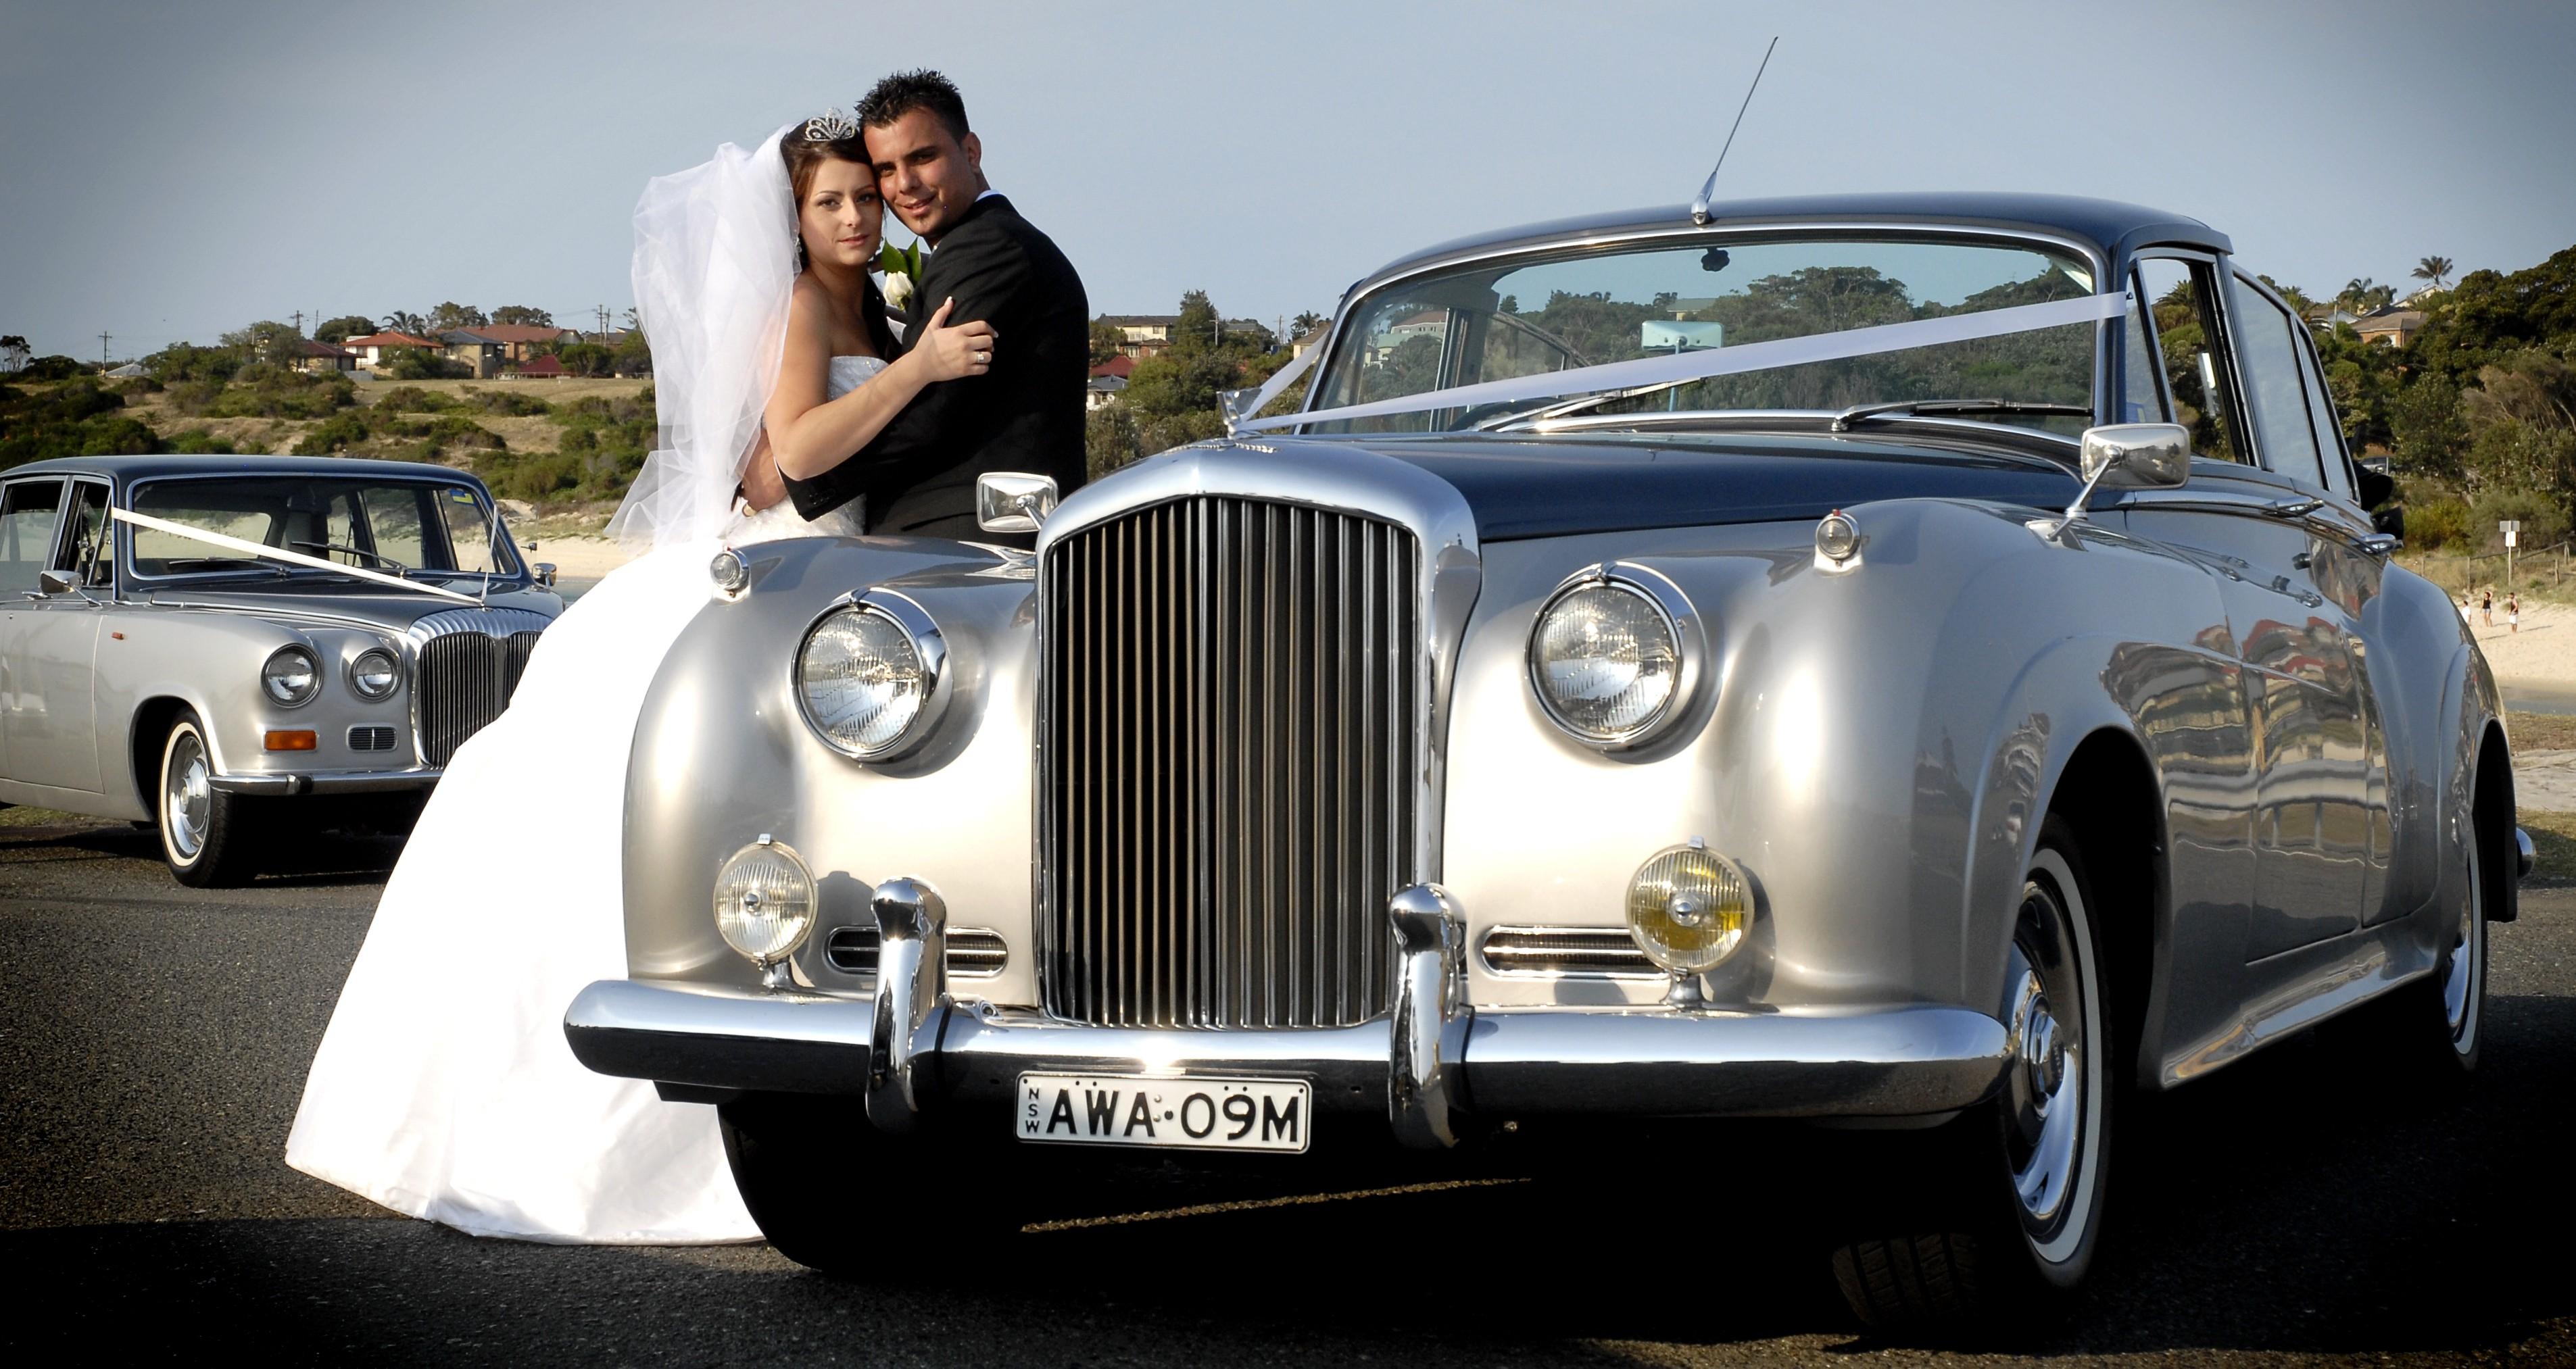 Best 10 Wedding Cars